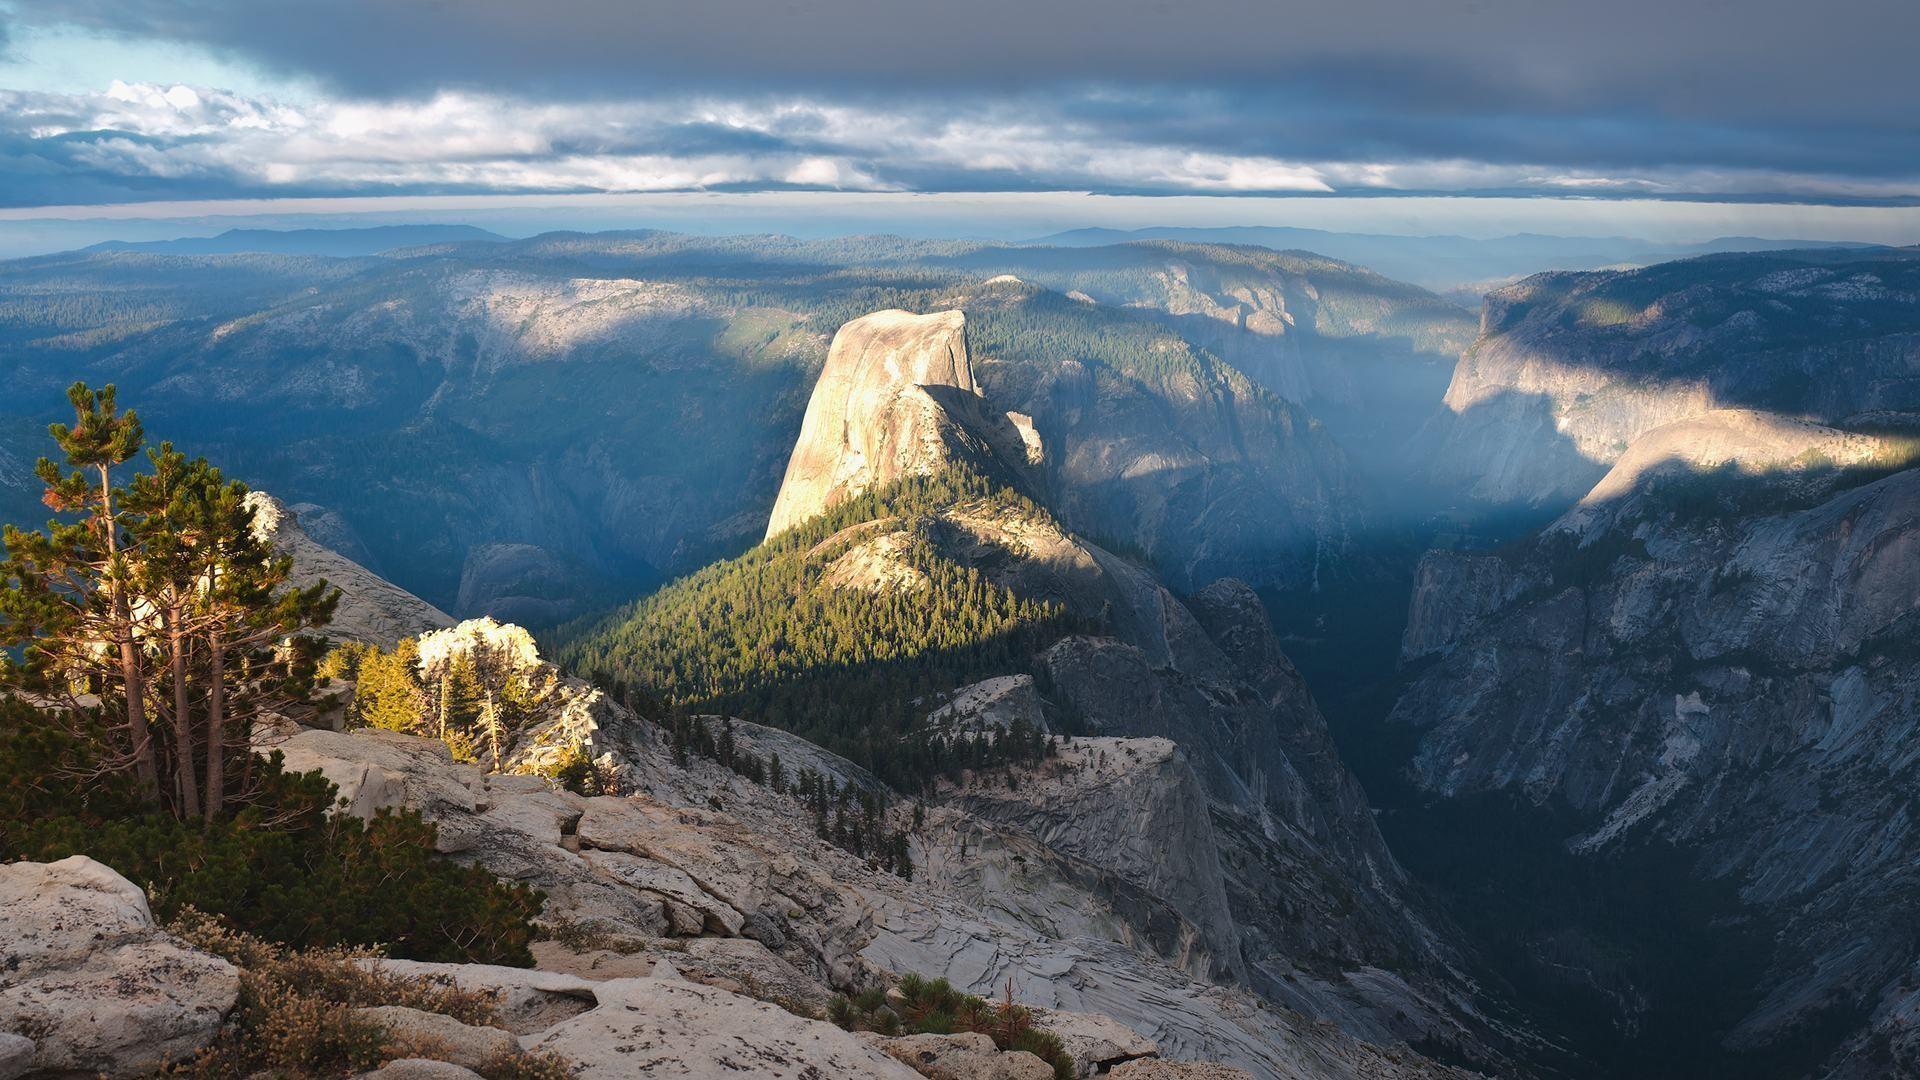 Fondo De Pantalla Paisaje Montañas Nevada: Fondos De Pantalla : Paisaje, Montañas, Naturaleza, Nieve